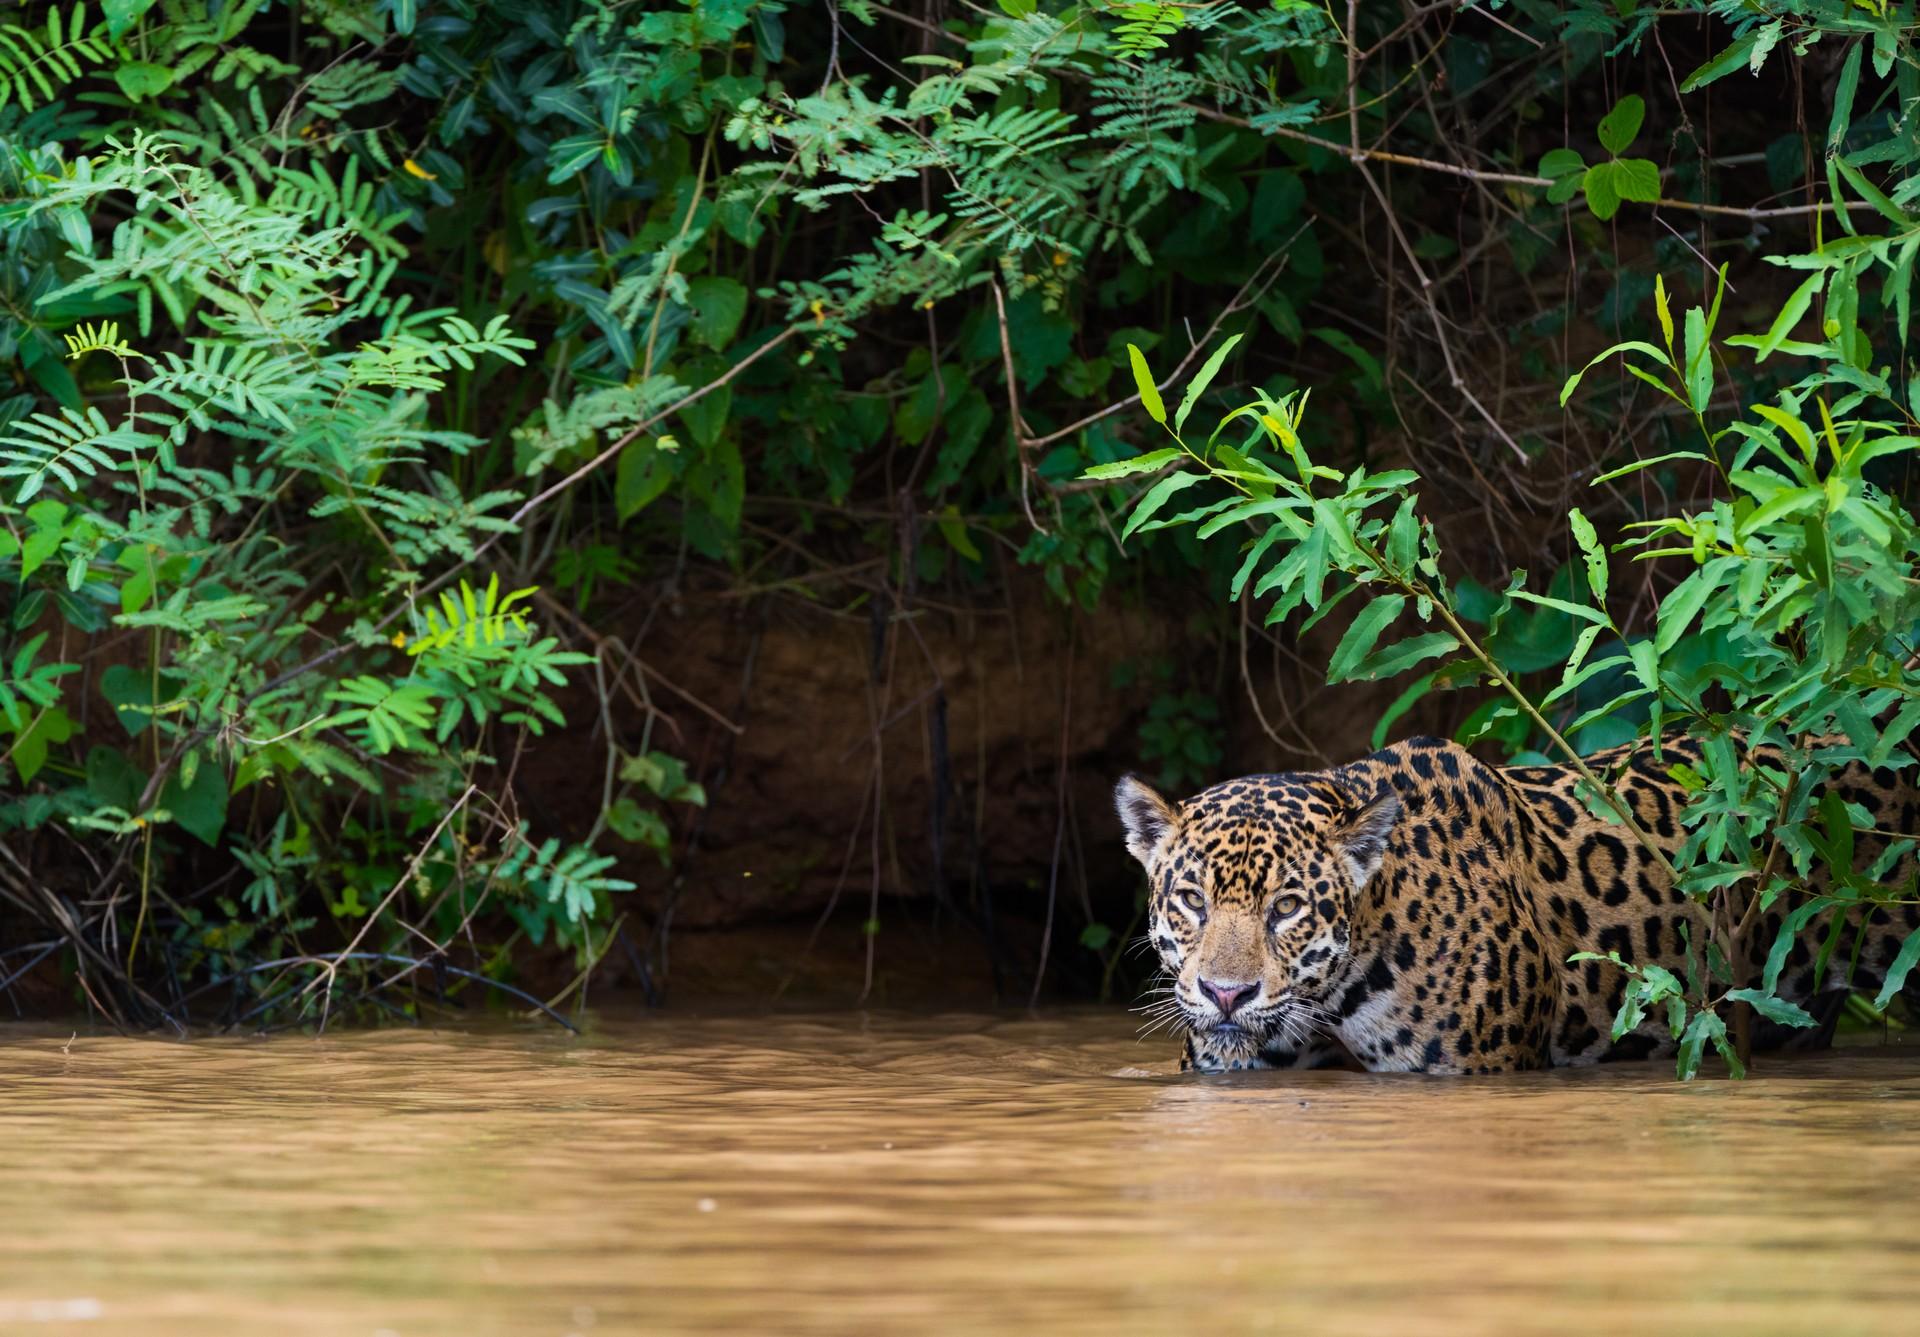 Jaguar hunting in the Pantanal, Brazil